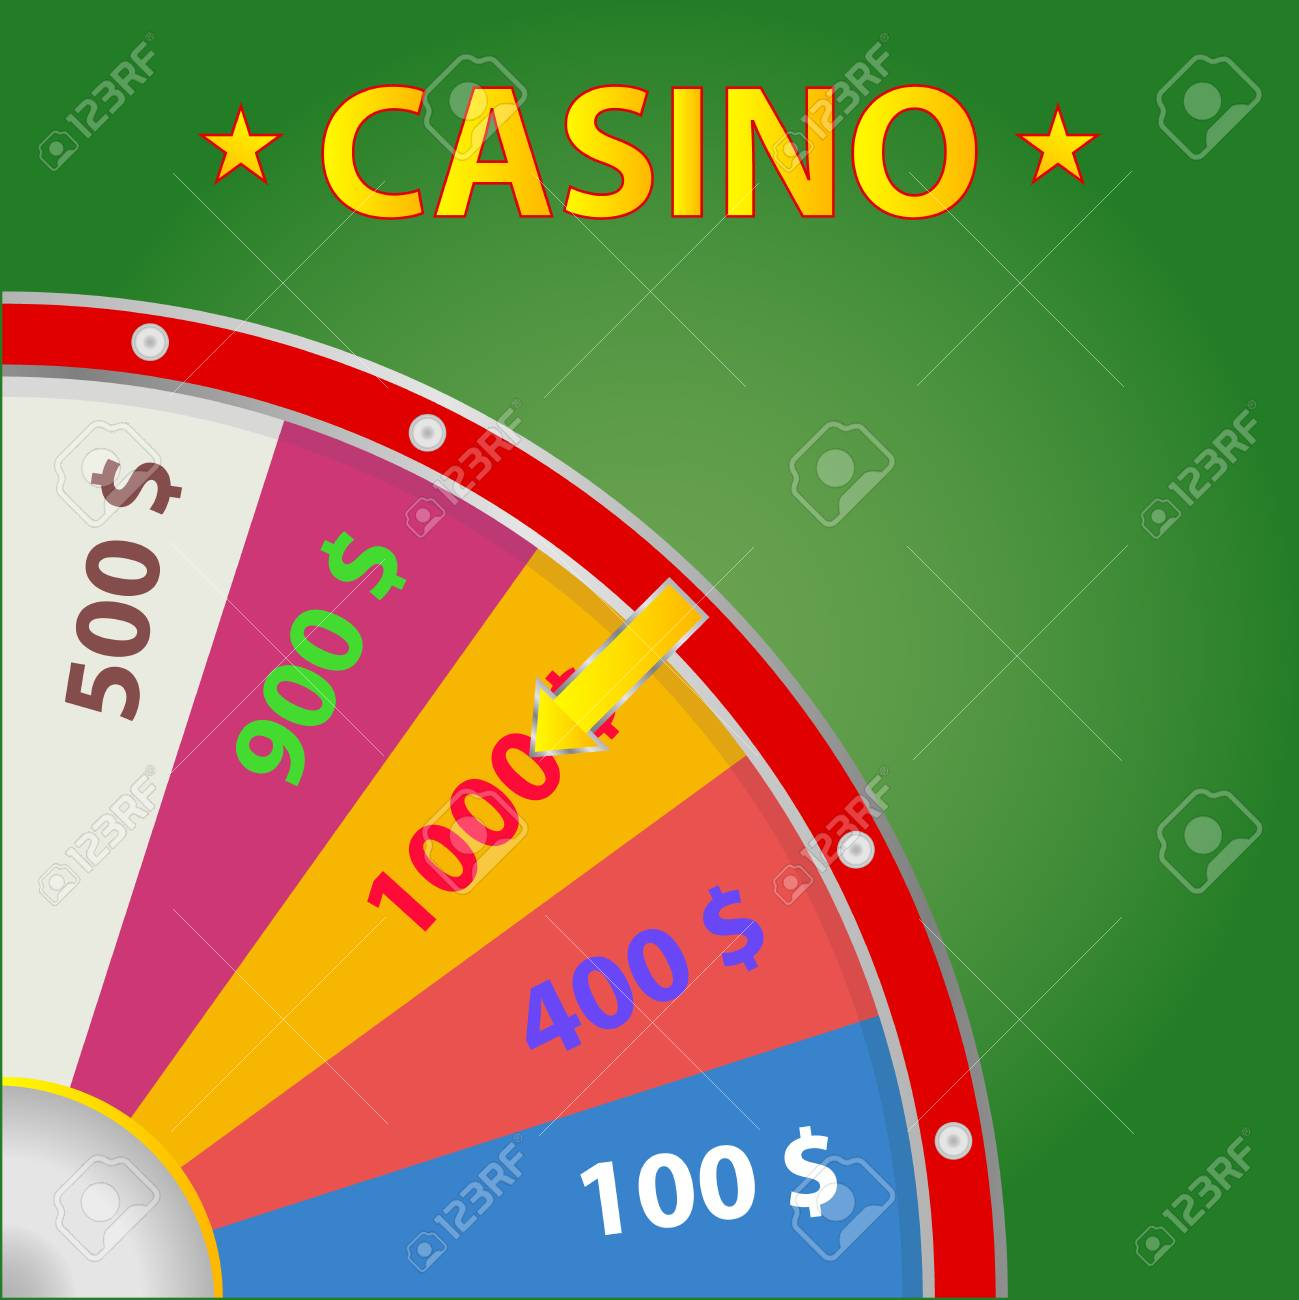 Casino Wheel of Fortune Flat design vector illustration - 80115854